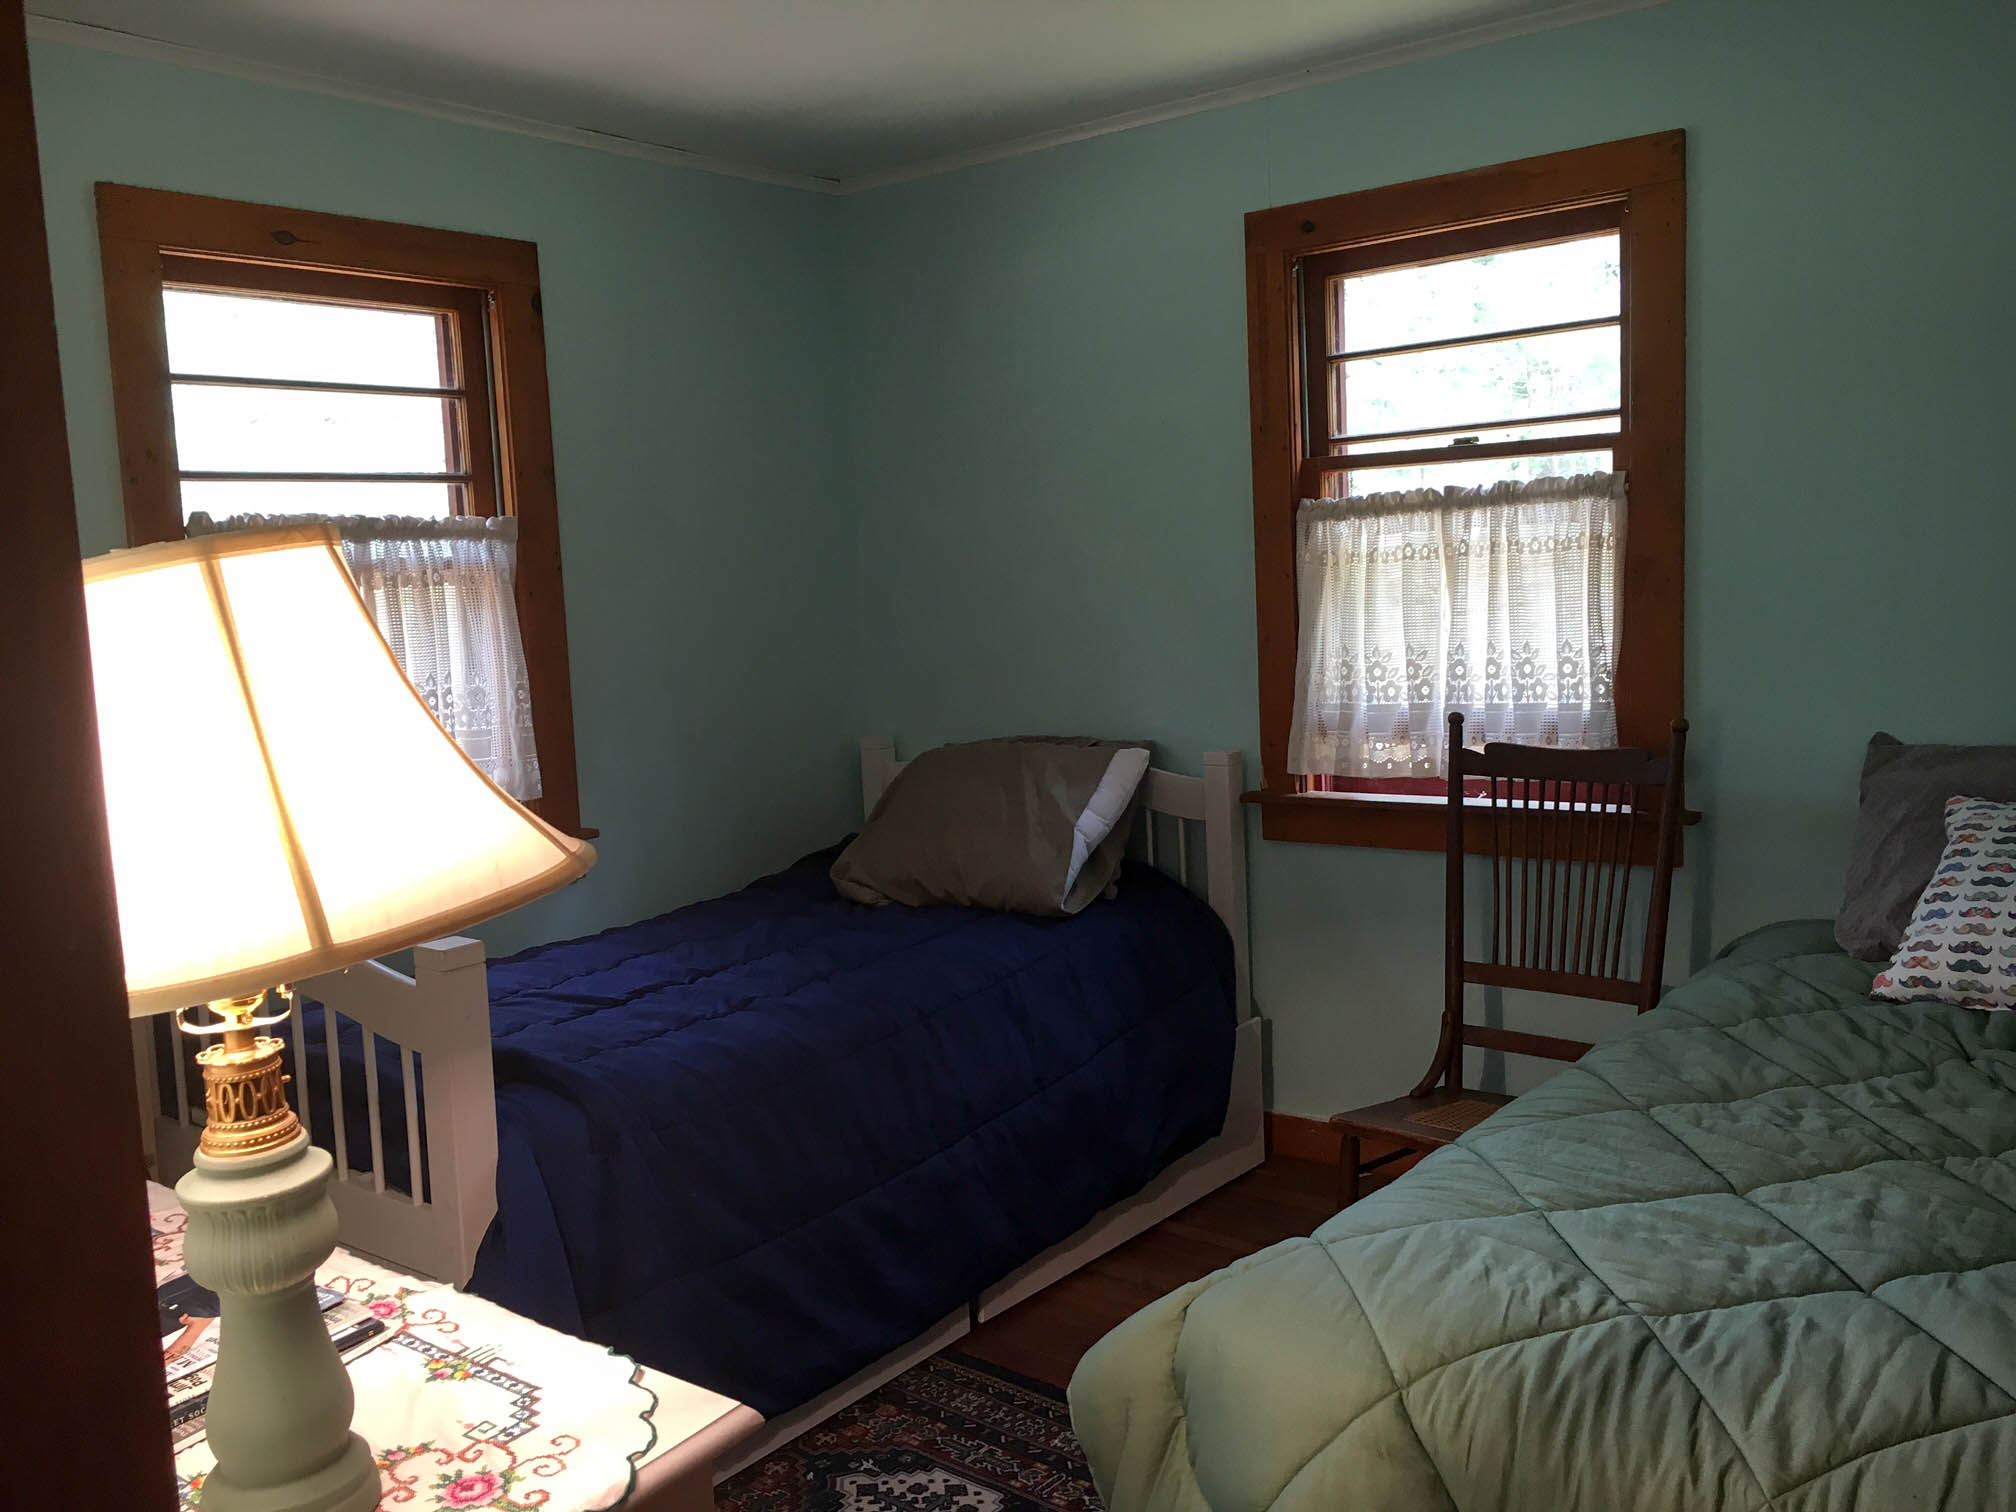 cabin_bed1.jpg